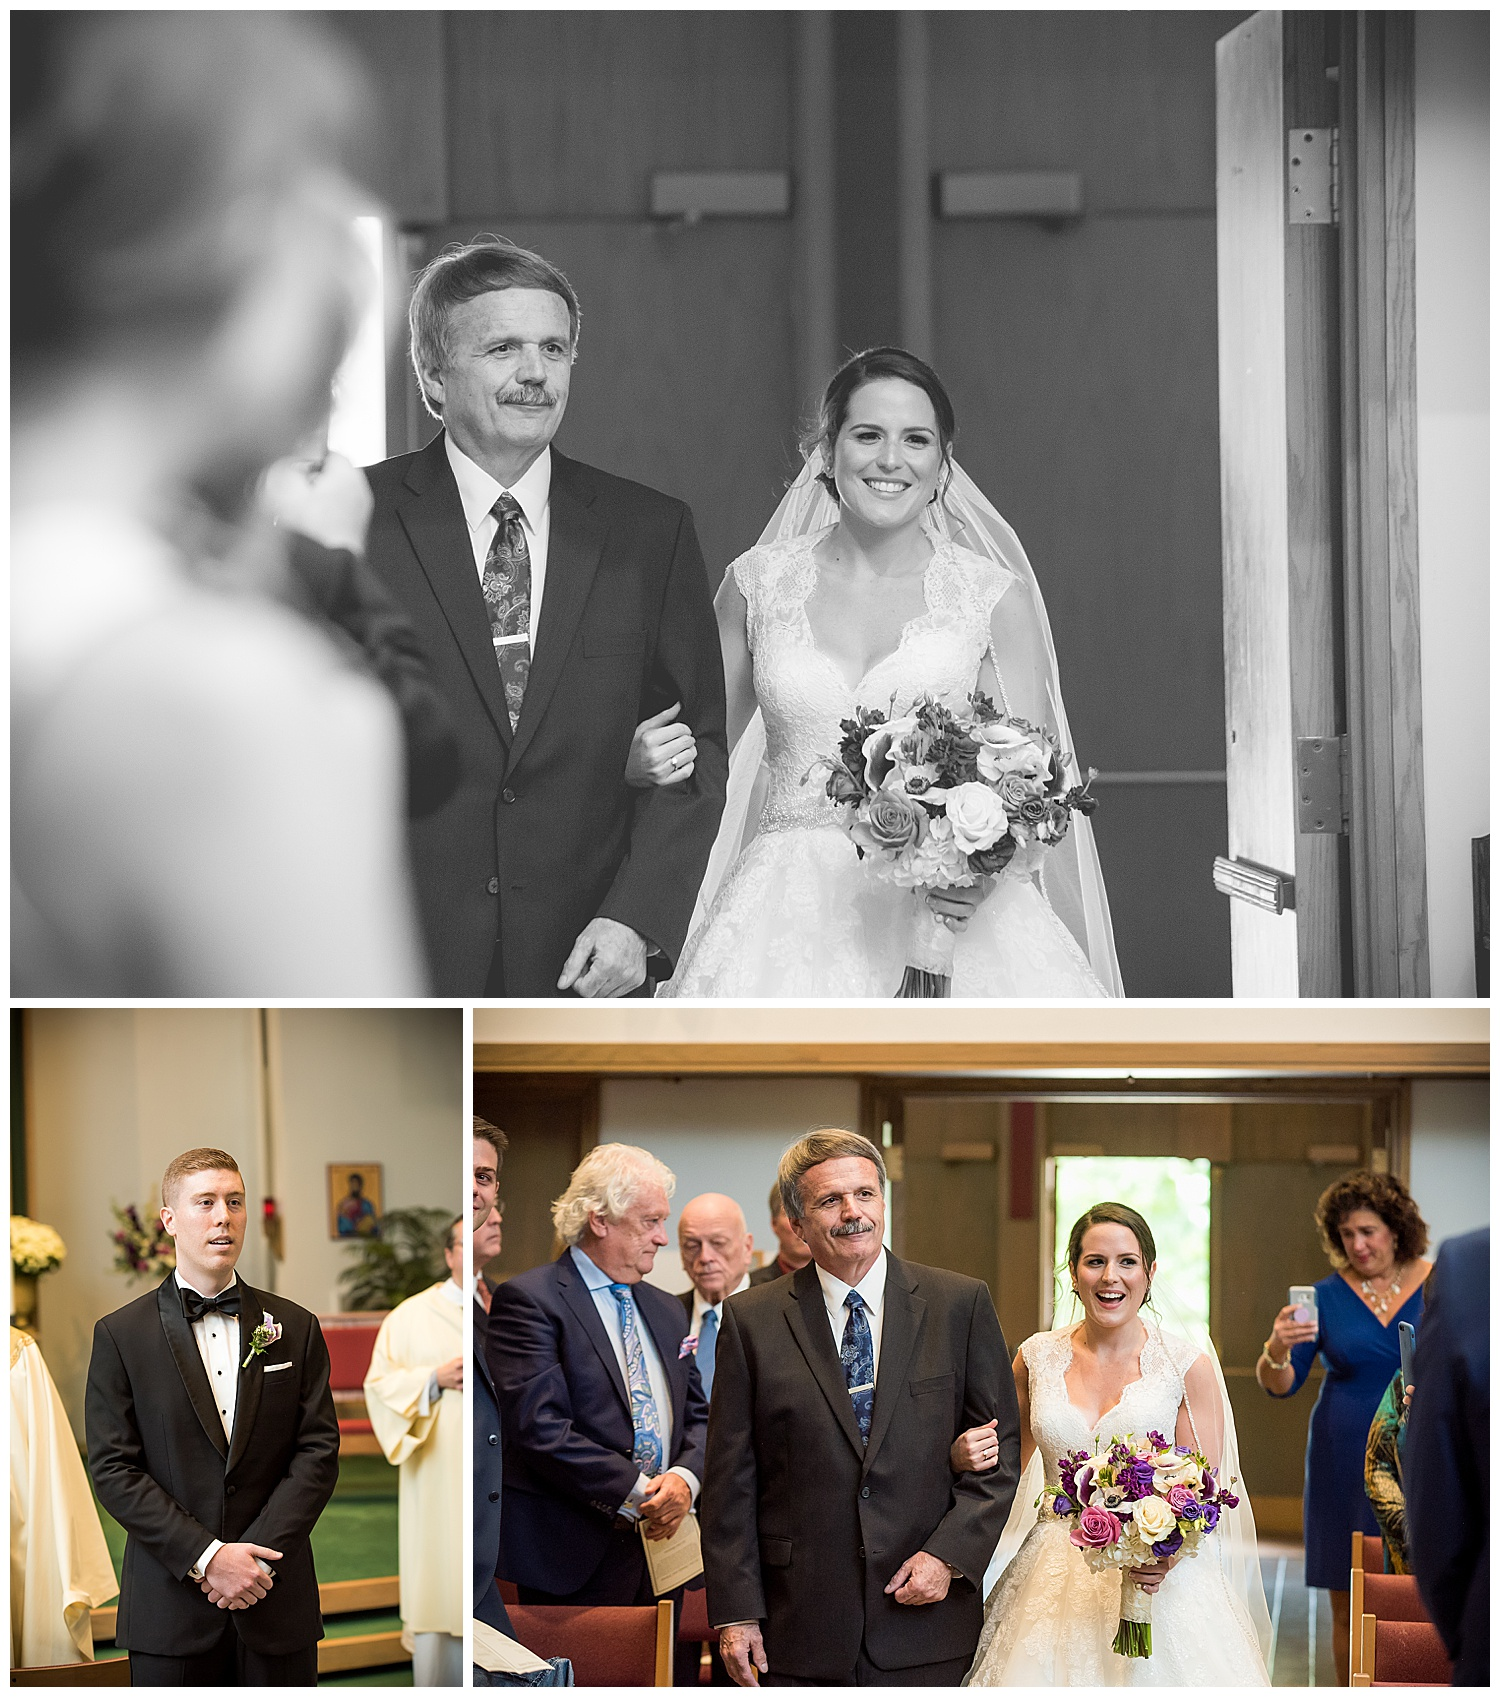 St. Mark's Church Londonderry - Wedding Ceremony